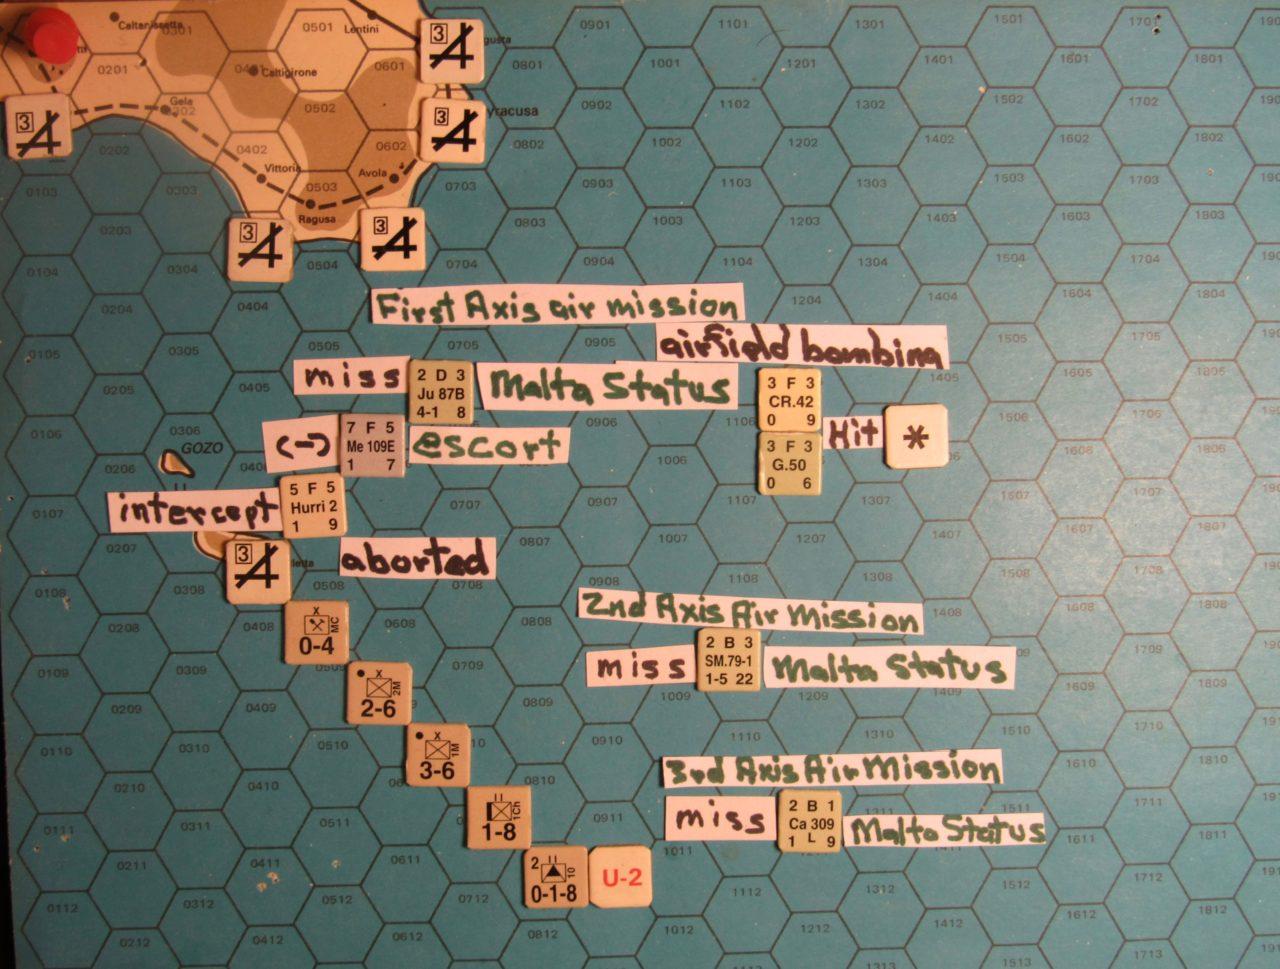 WW 1941 ME/ER-II/Crete Scenario May II 41 Axis beginning of the Movement Phase